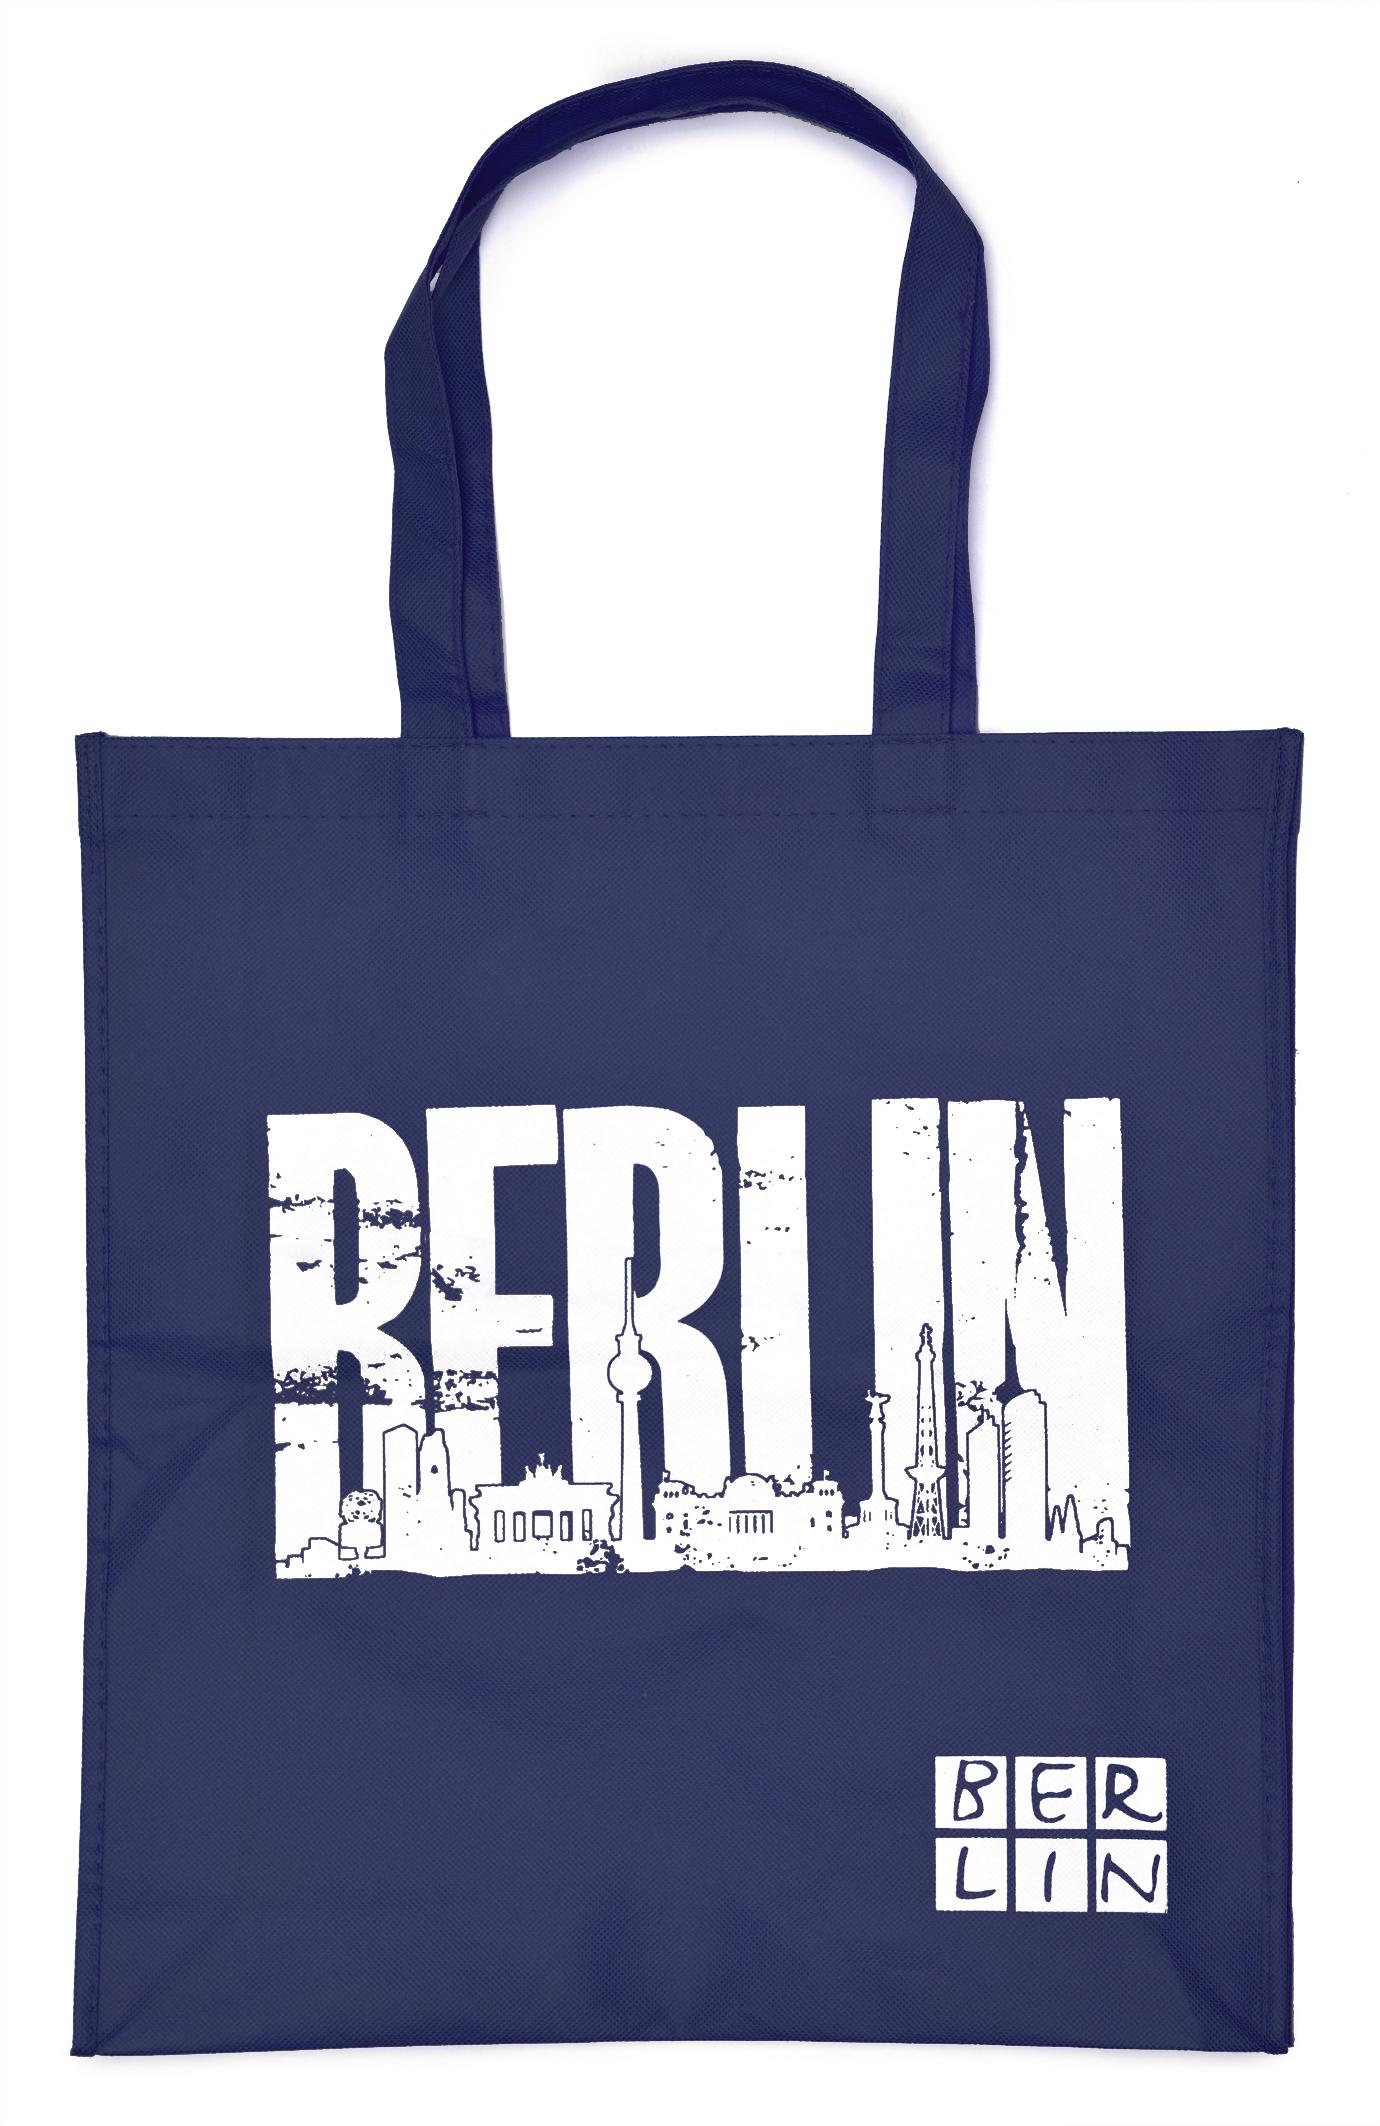 030-0084_Shoppingbag_BERLIN_skyline-dunkelblau